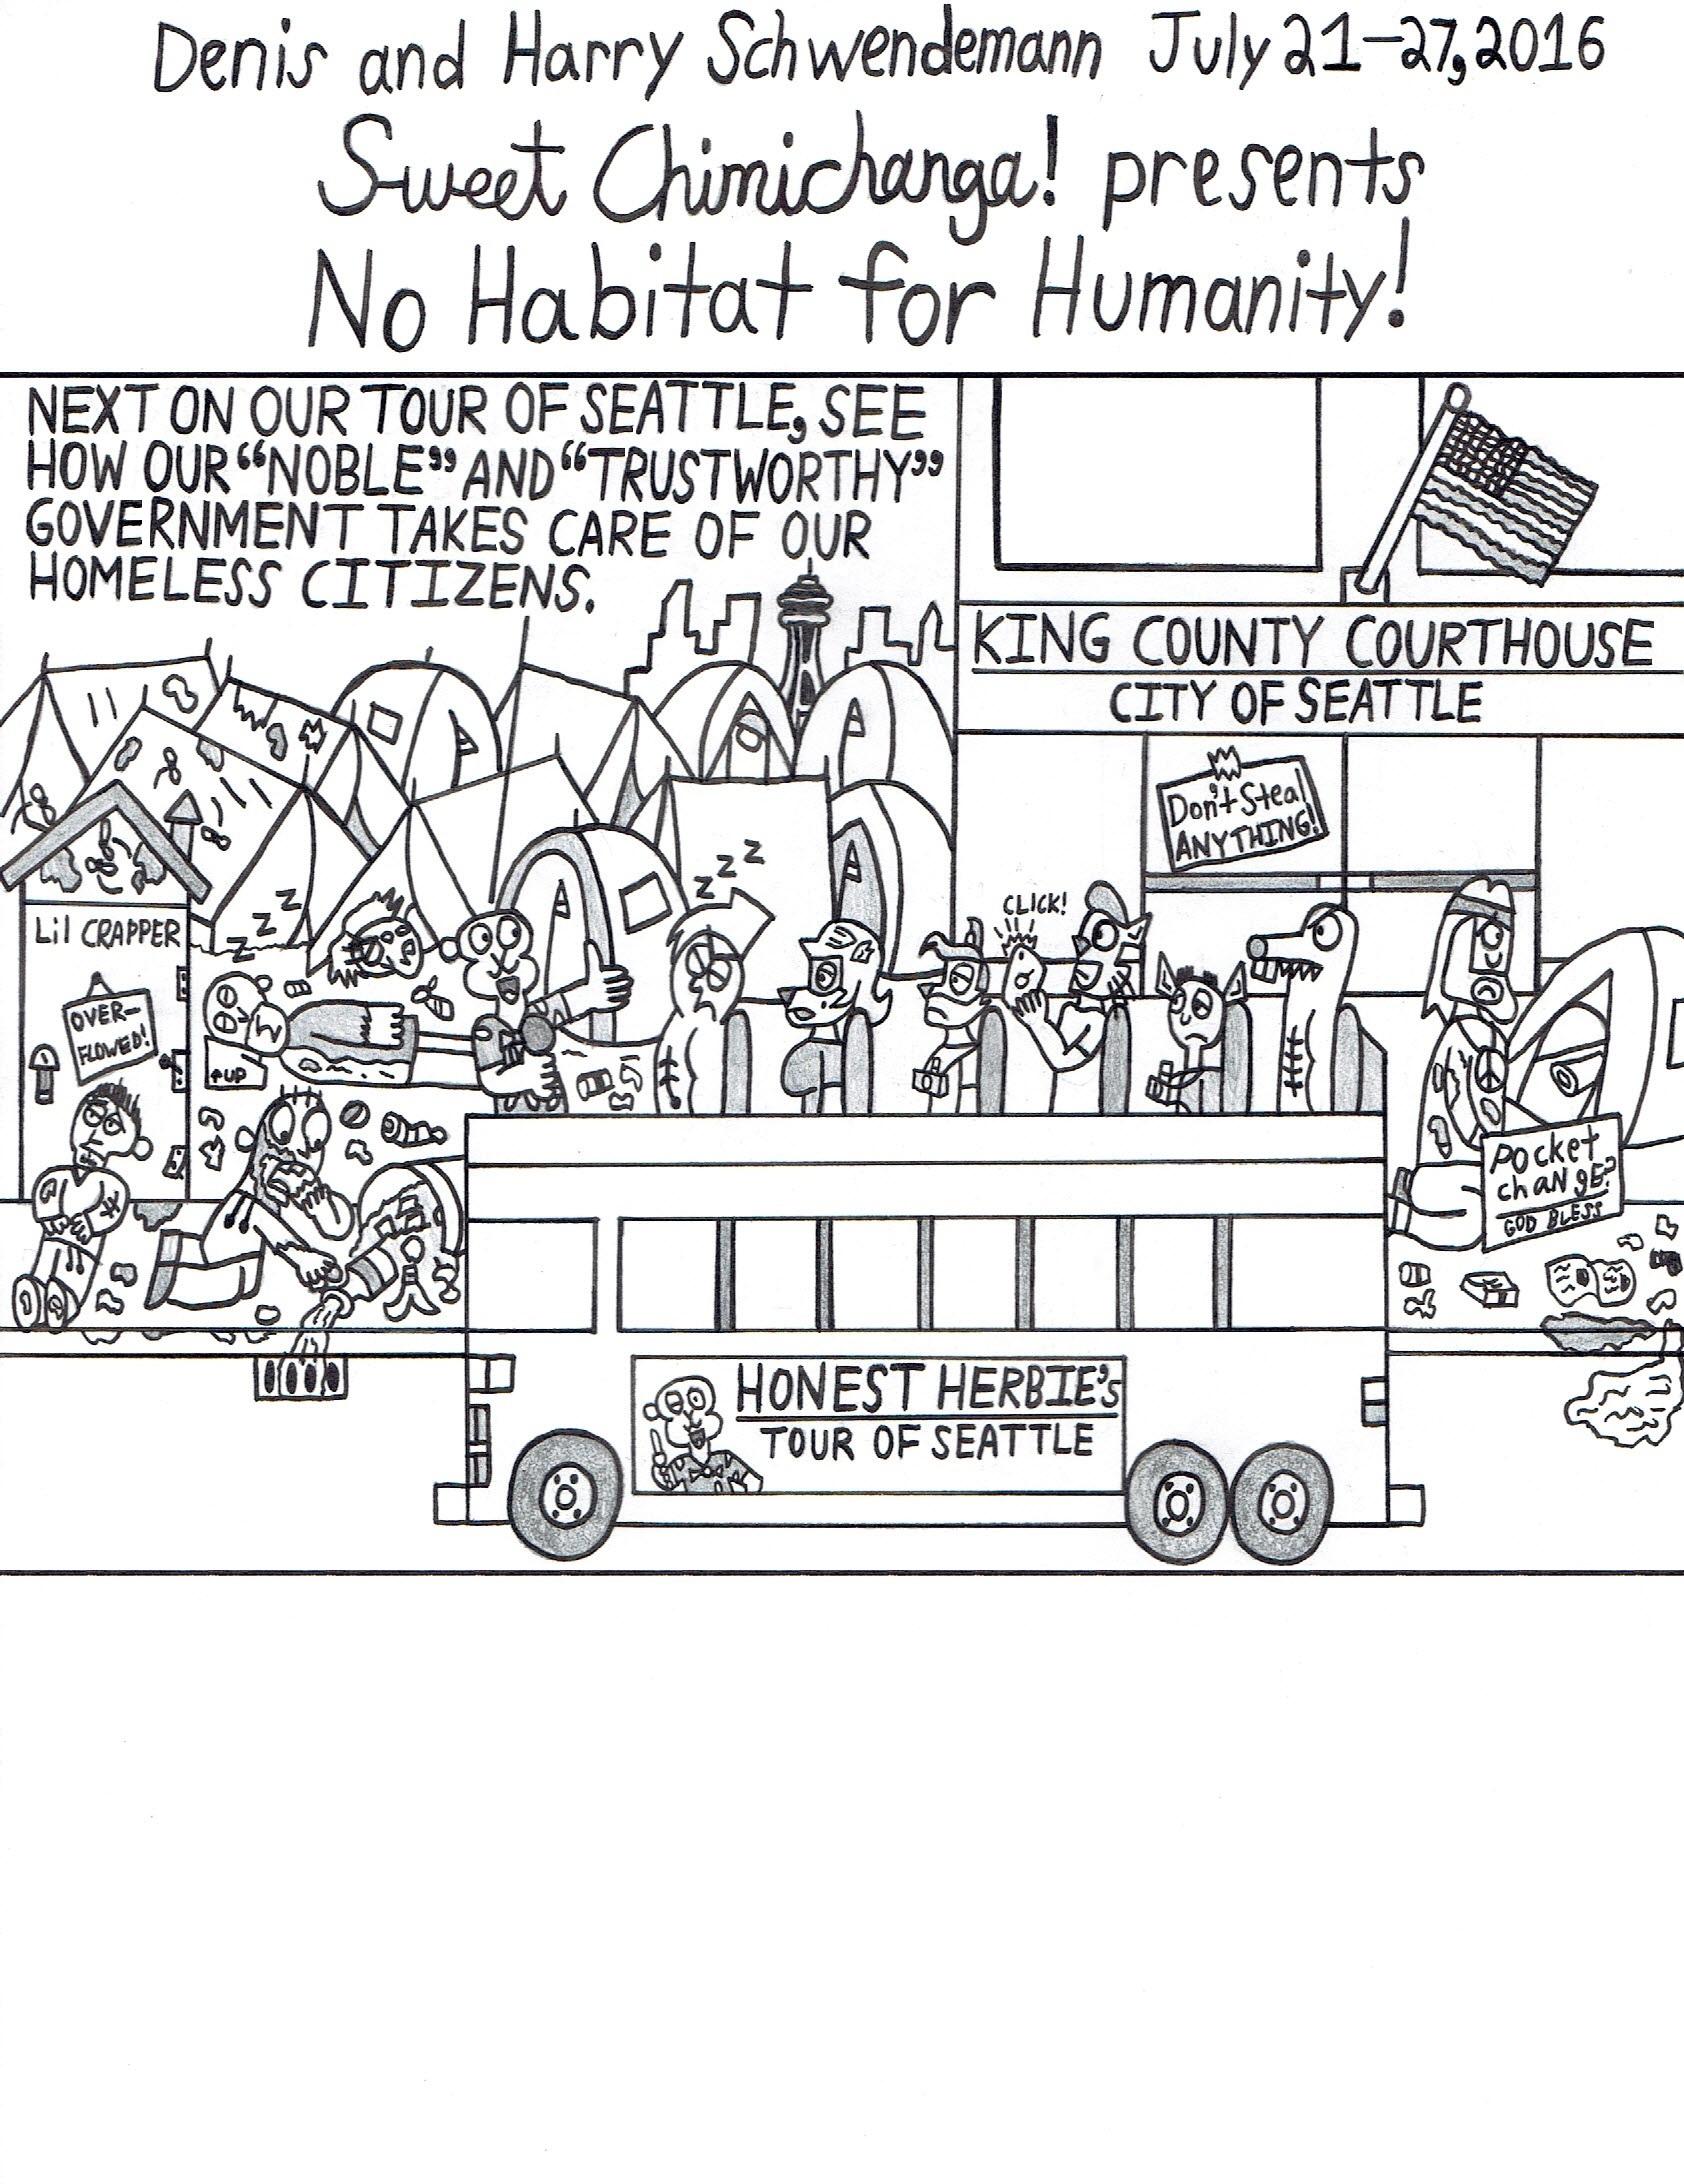 No Habitat for Humanity!